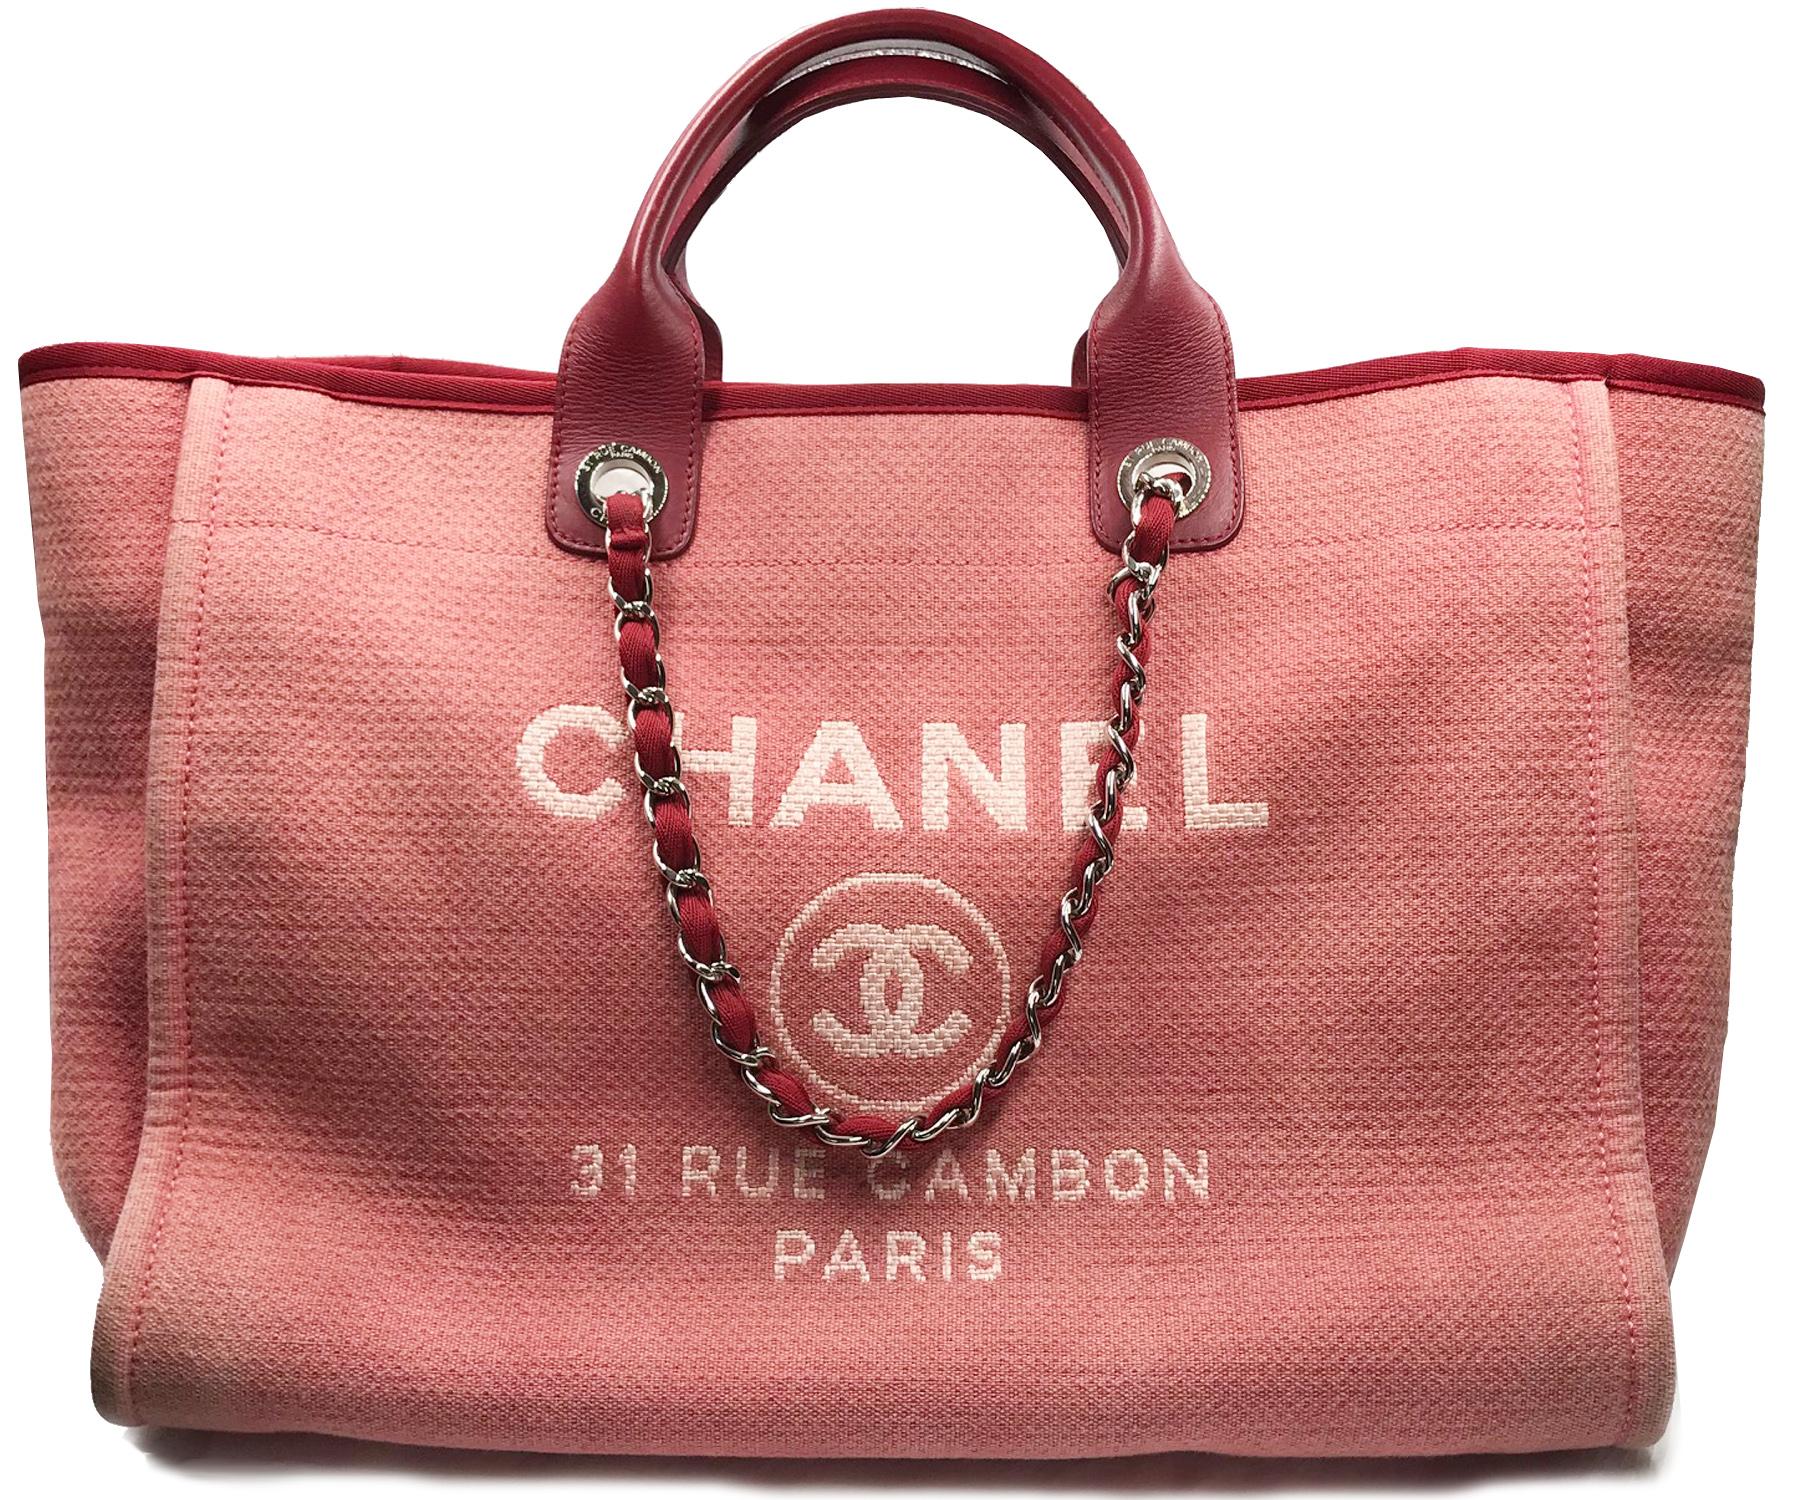 Chanel Red Denim Deauville Large Tote Bag 1580 Lar Vintage Cc